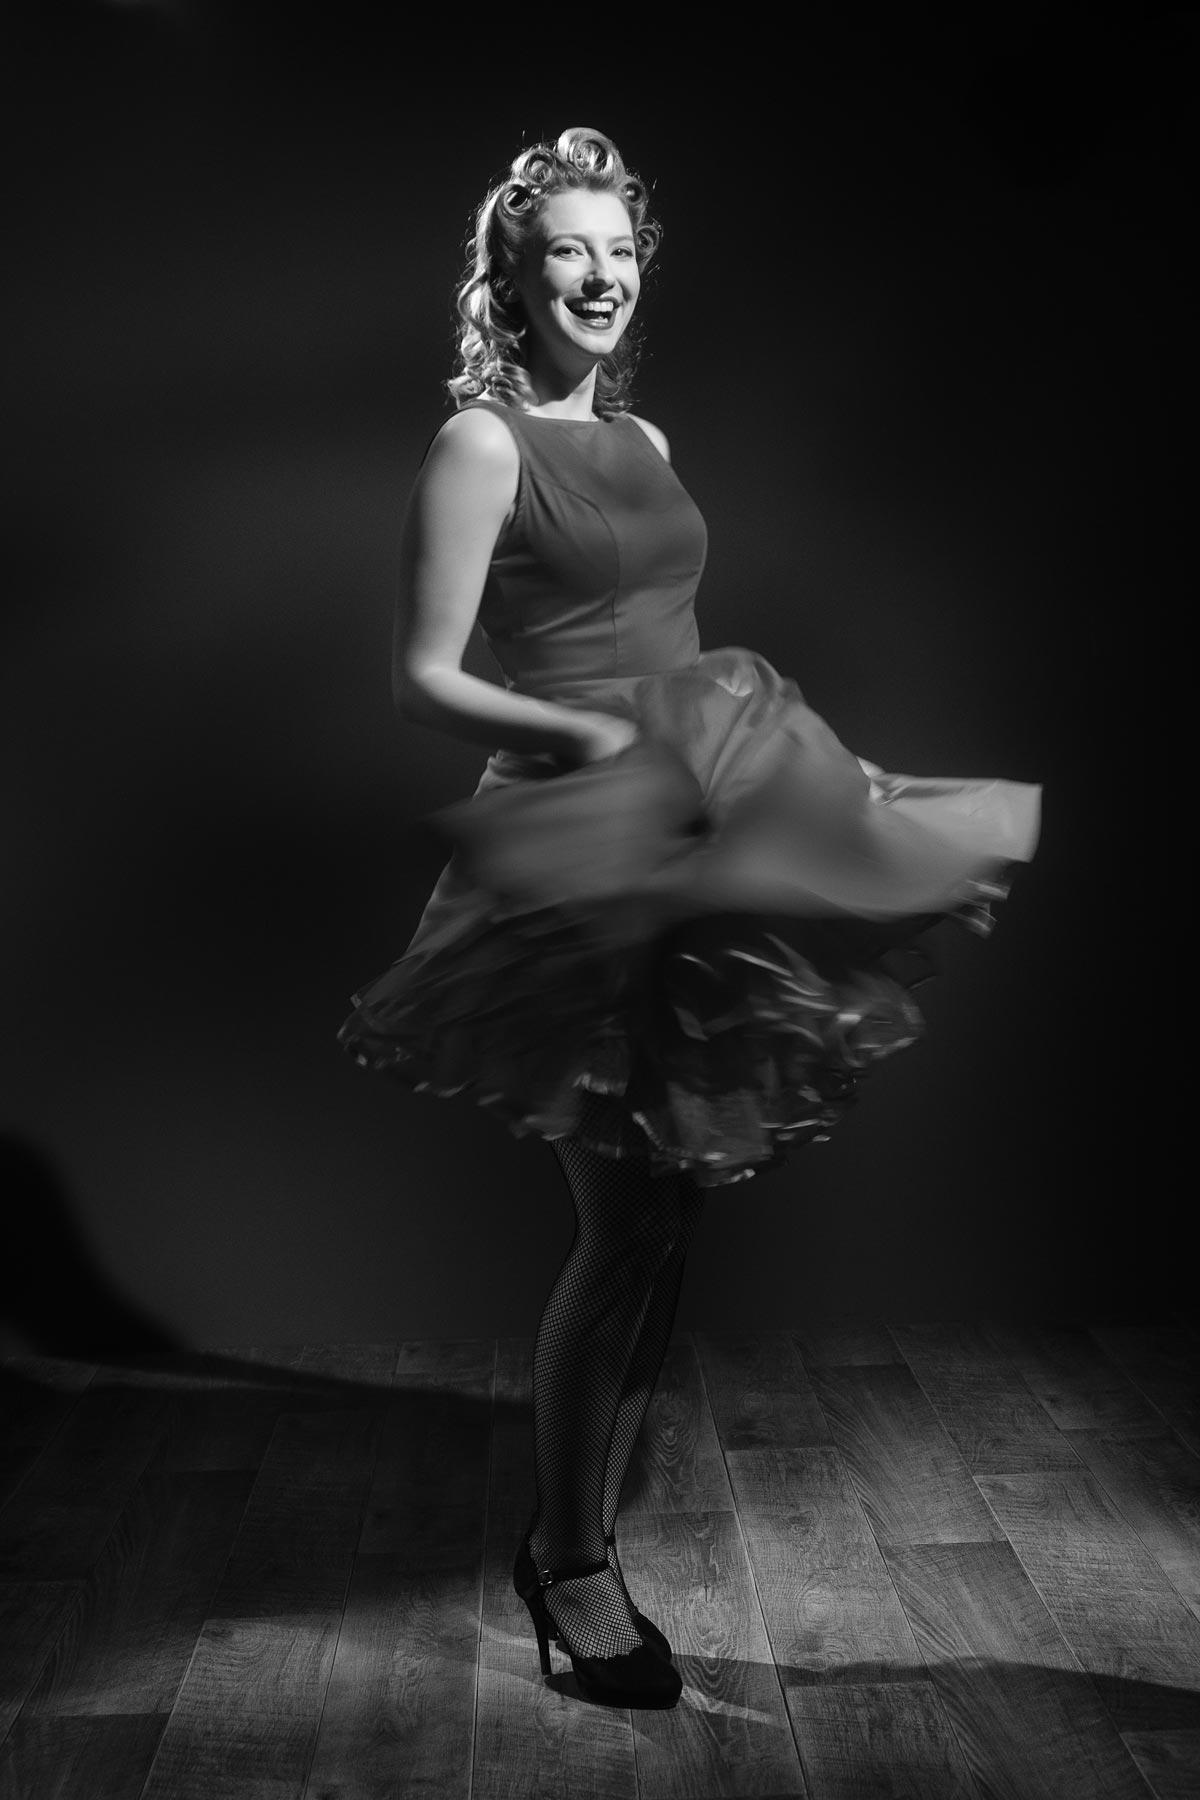 Claire Rammelkamp in the Lovegrove studio